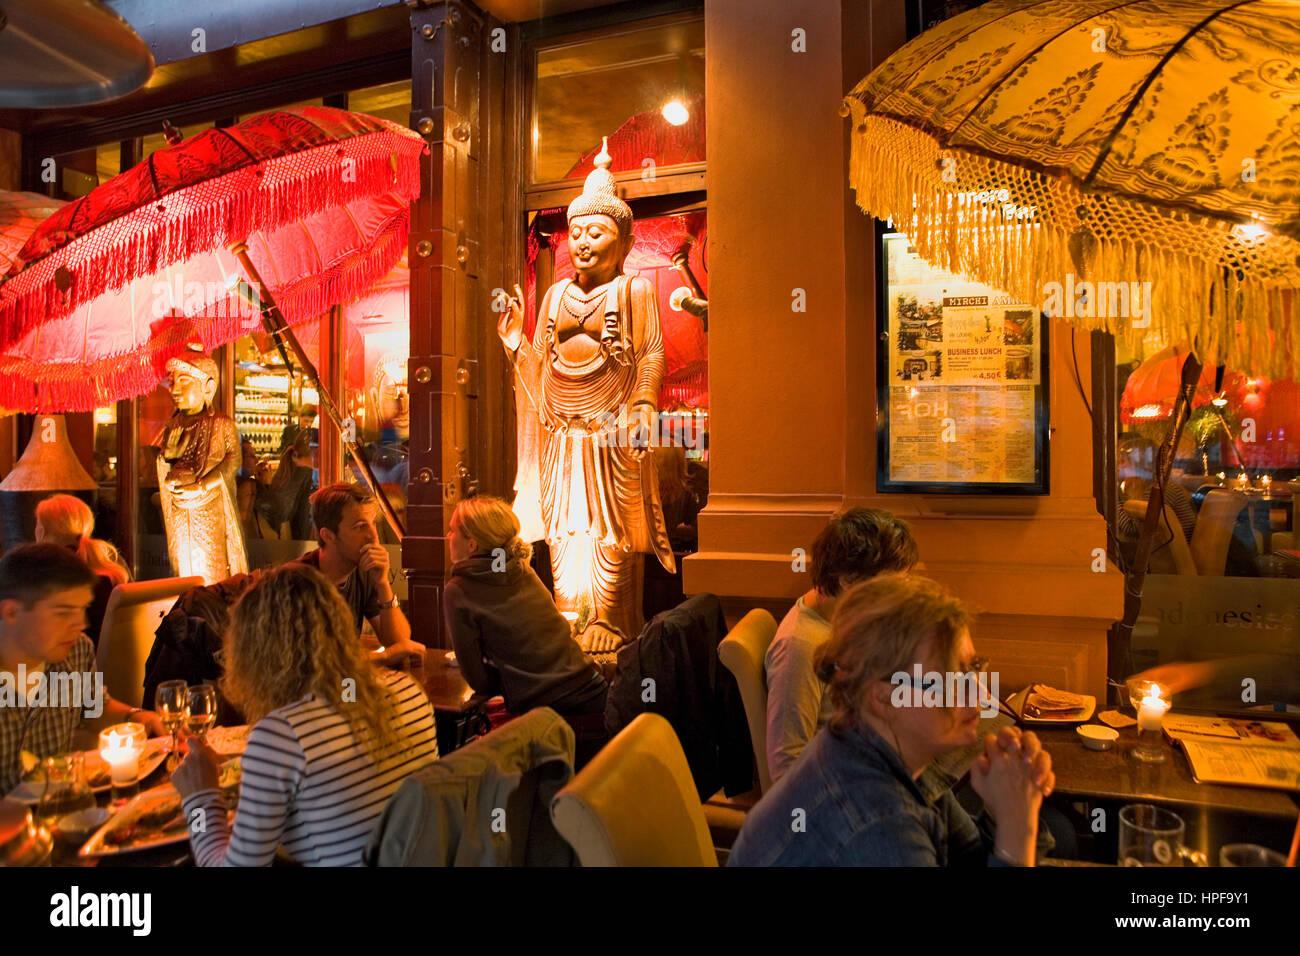 amrit indian restaurant oranienburgerstrasse 50 berlin germany stock photo royalty free. Black Bedroom Furniture Sets. Home Design Ideas